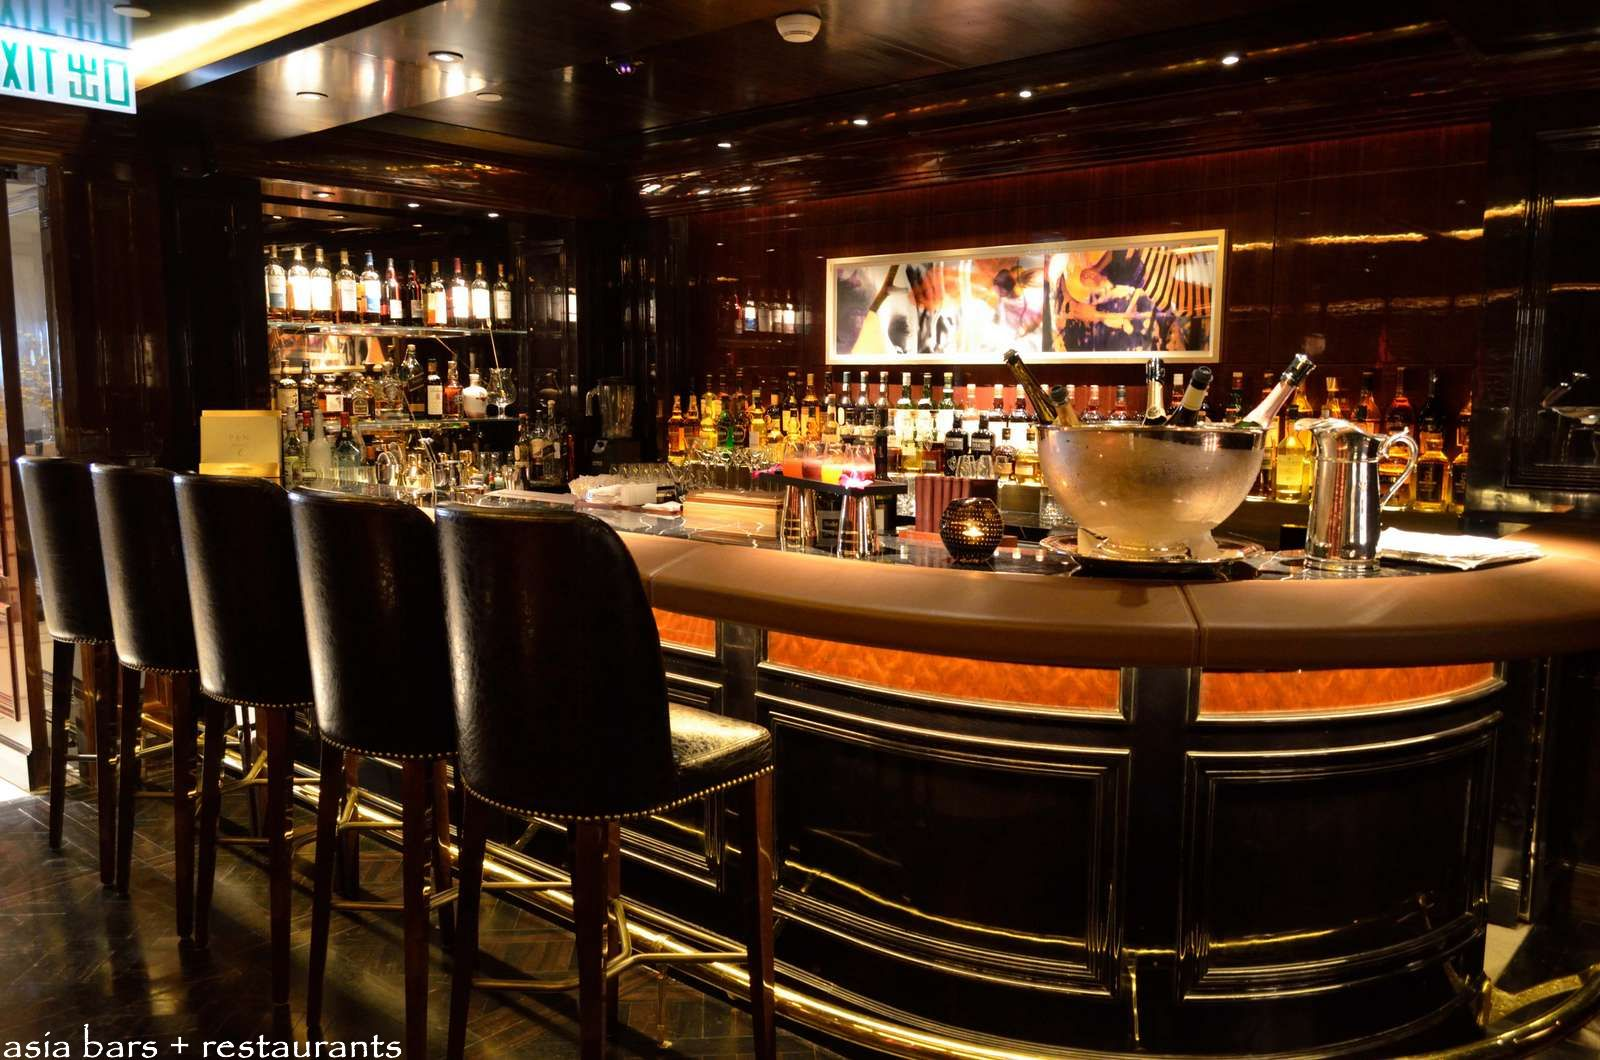 The bar the peninsula hong kong asia bars restaurants - Picture of bars ...